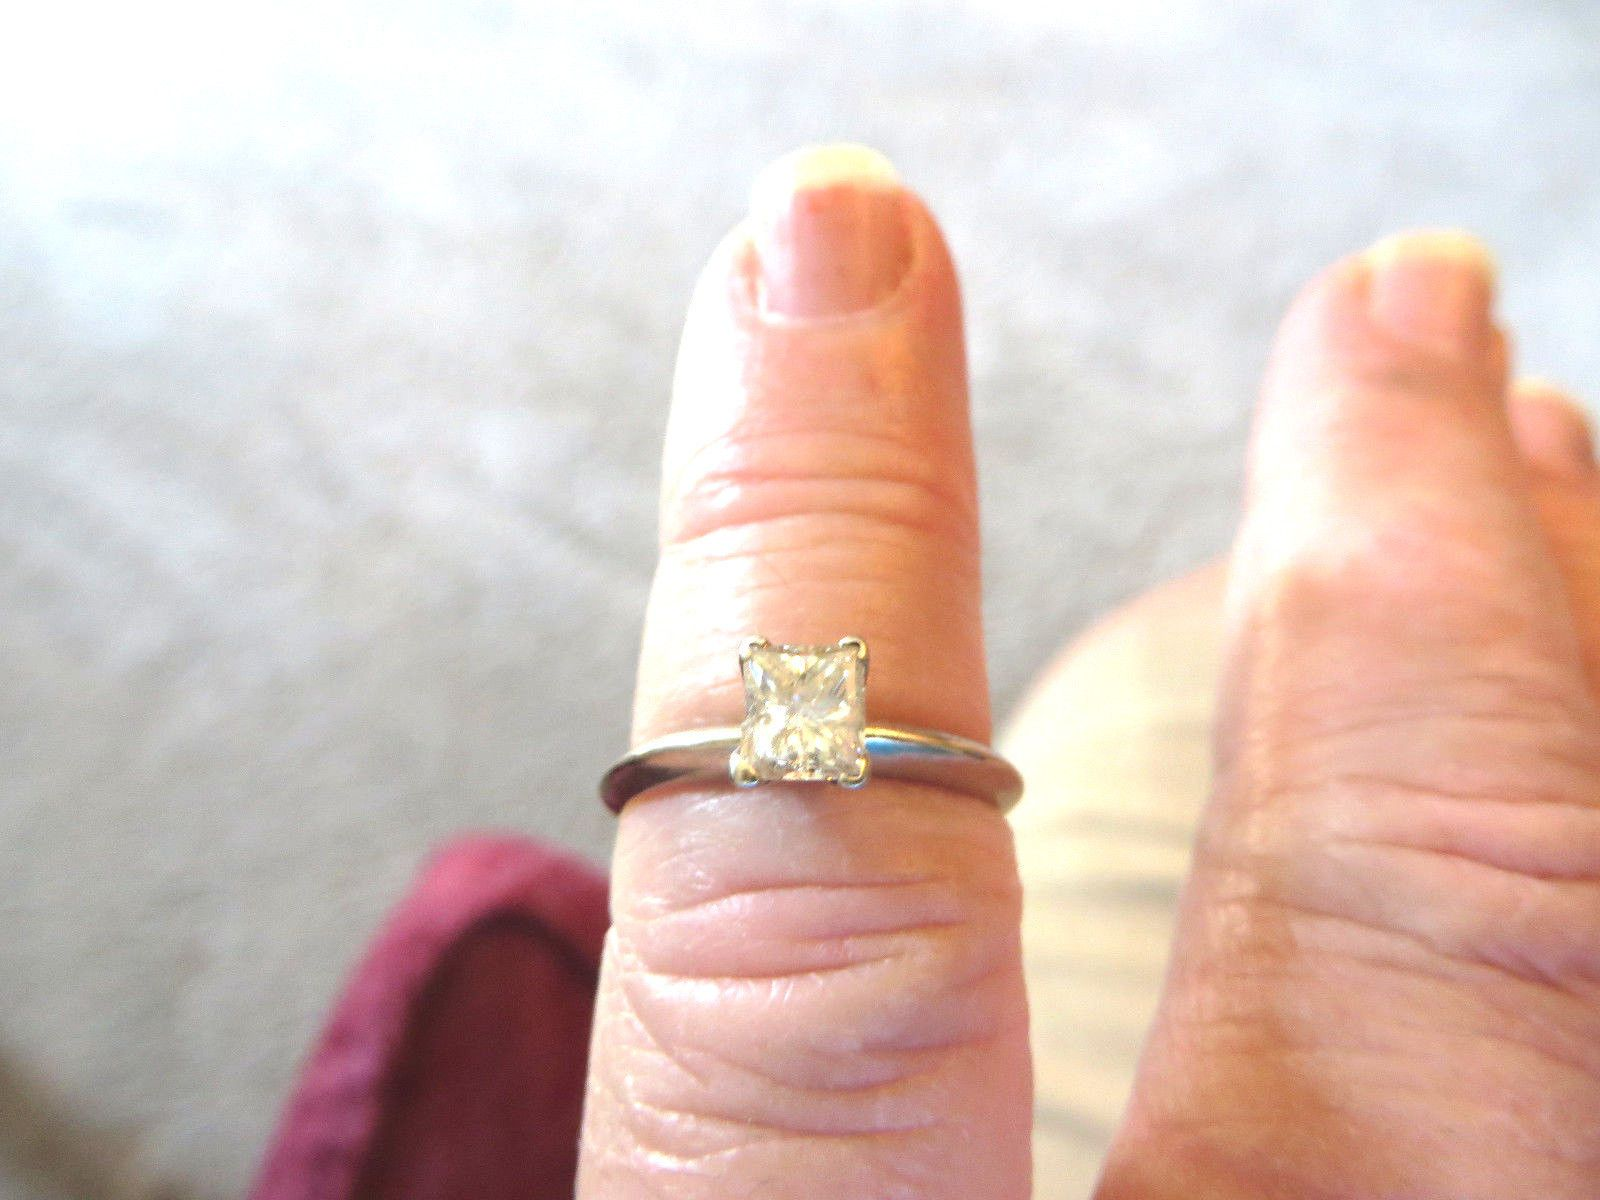 Jewelry k wg approximately tcw princess cut diamond solitaire